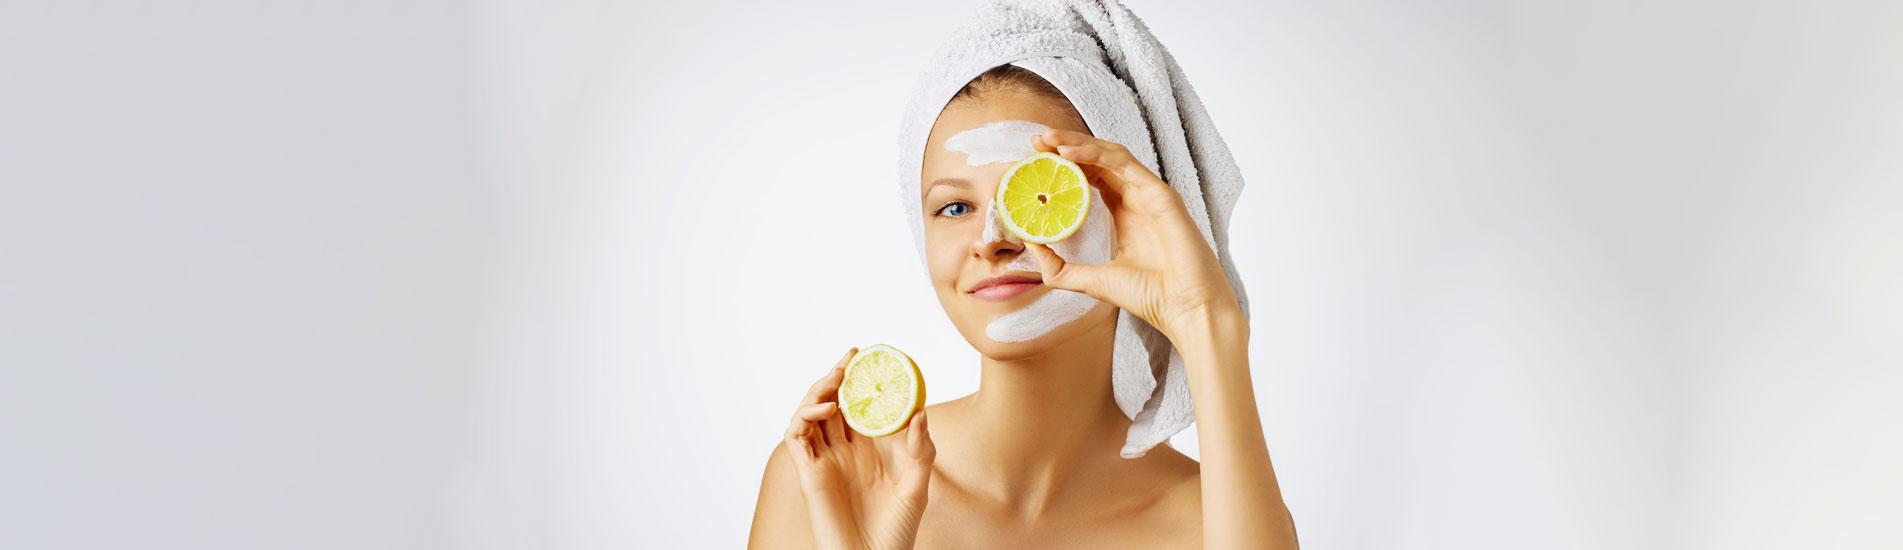 Hautarztpraxis am Roseneck - Fruchtsäure-Peeling